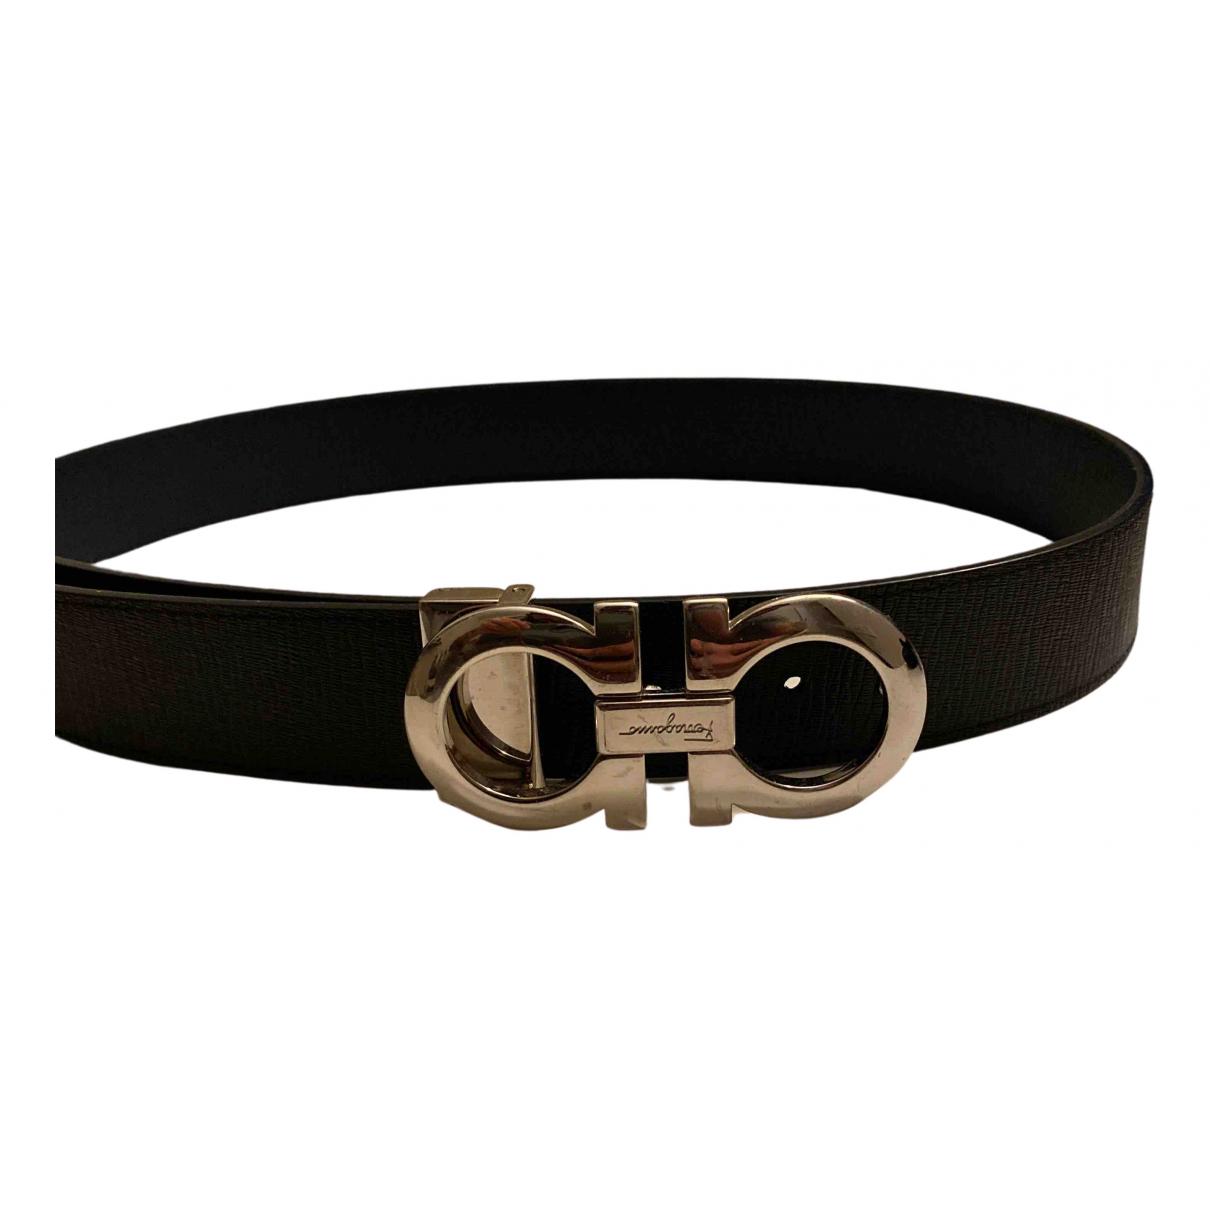 Salvatore Ferragamo N Black Leather belt for Men 100 cm